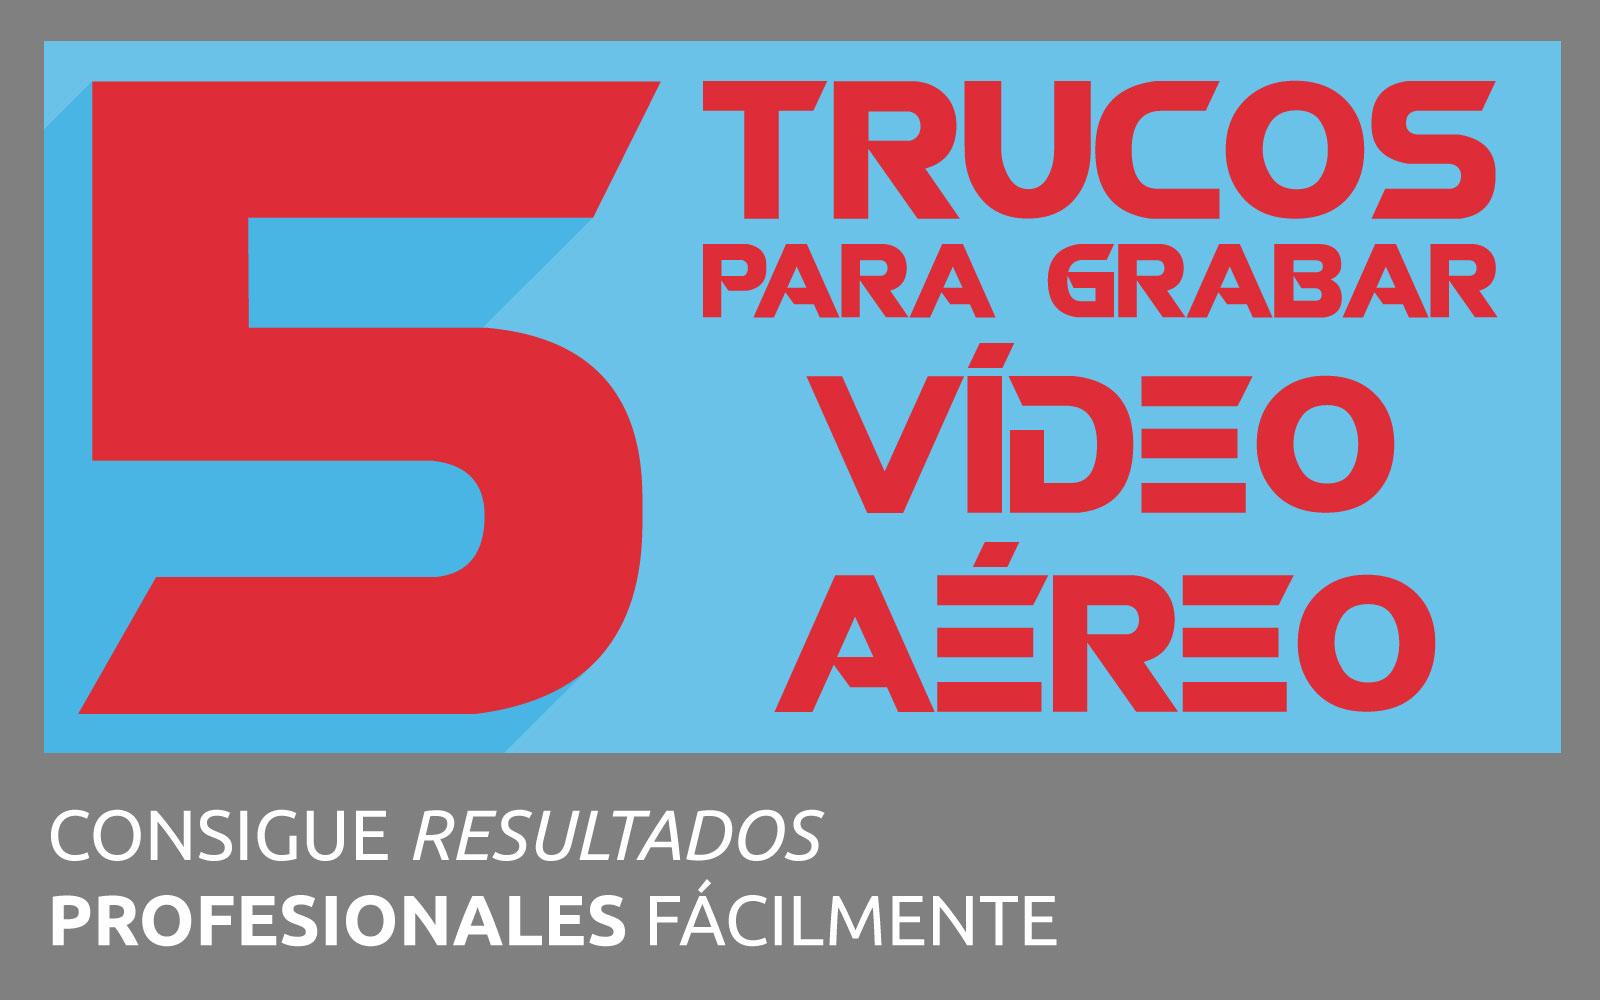 5 trucos para grabar vídeo aéreo profesional